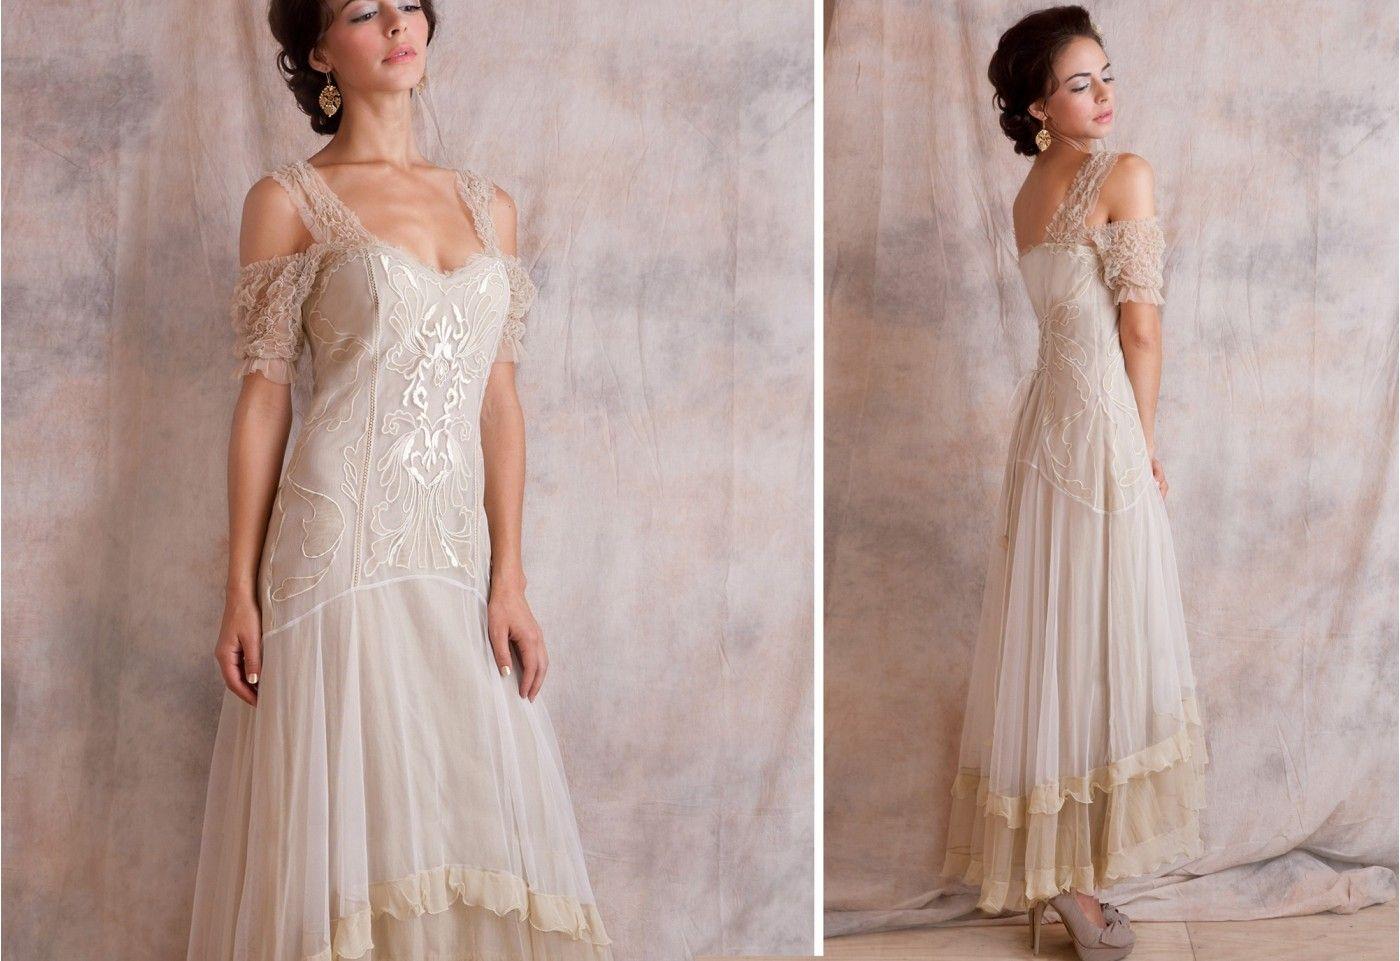 Untraditional wedding dresses  Denielle Ciletti innate on Pinterest